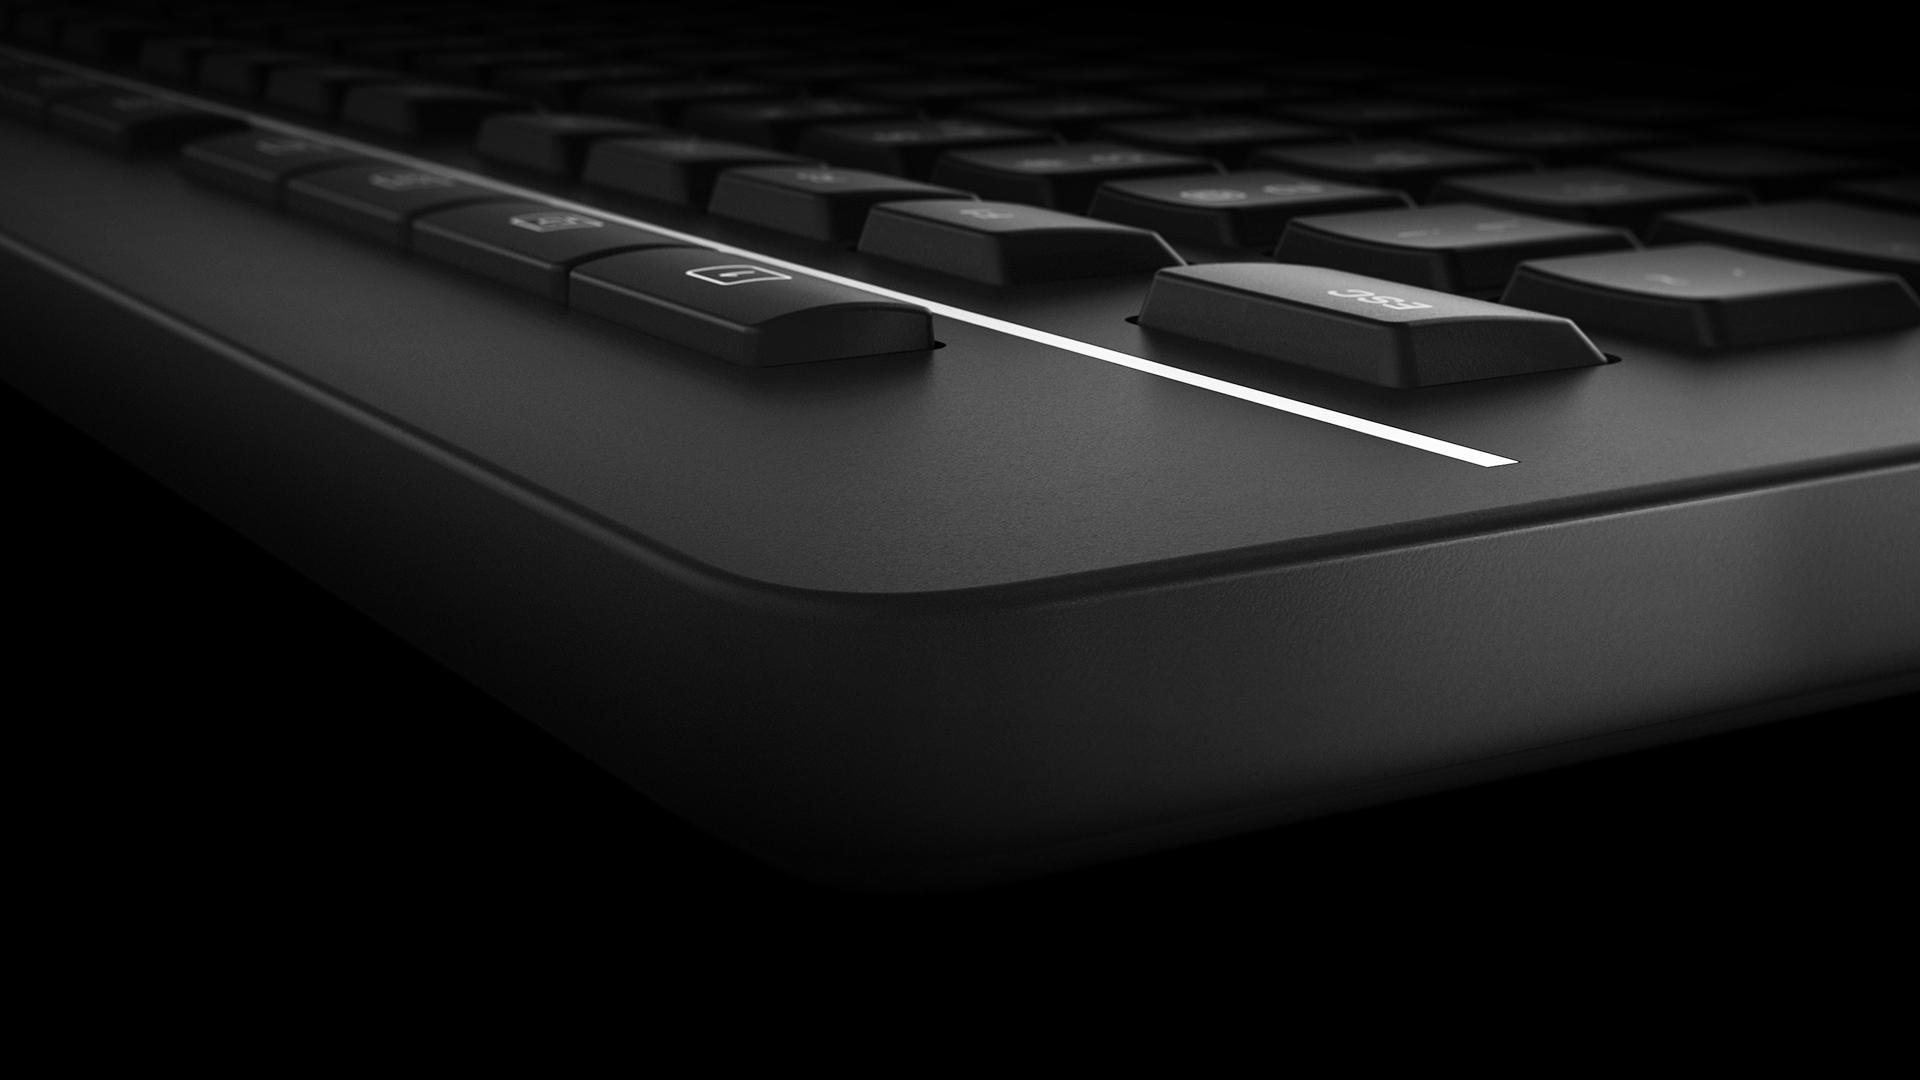 3Dconnexion Keyboard Pro Video